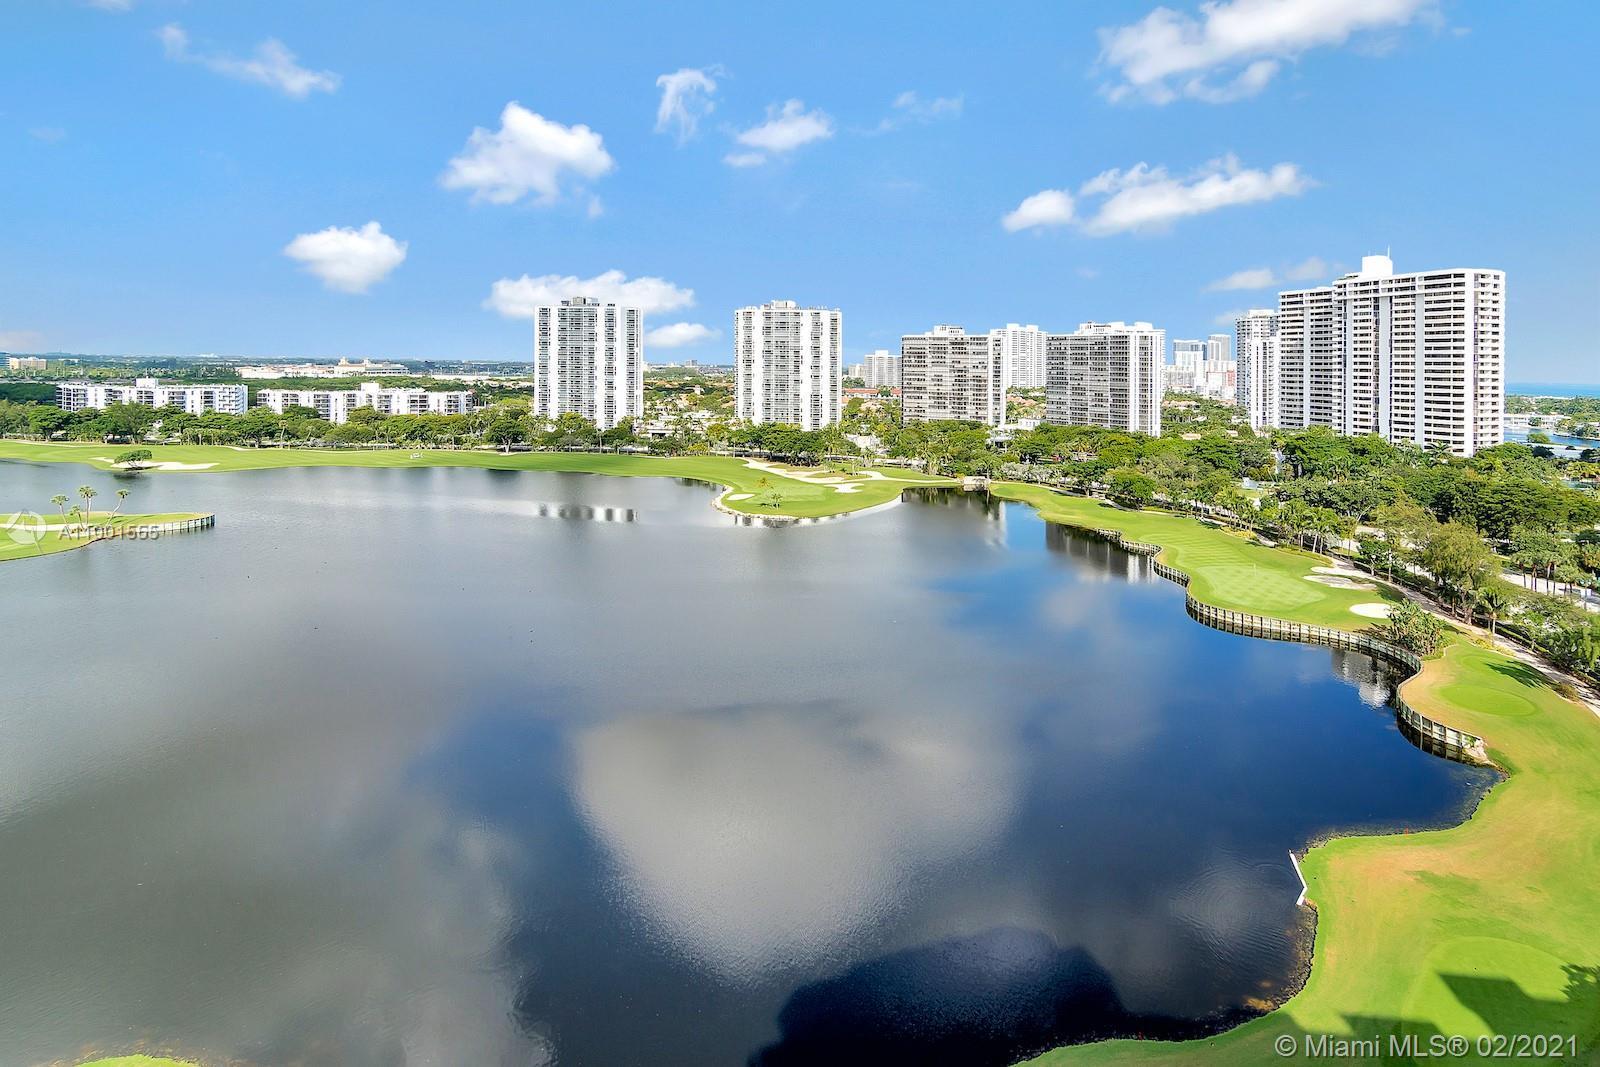 Delightful 3bed/3baths unit on the 11th floor, with spectacular Golf views. Prestigious building loc